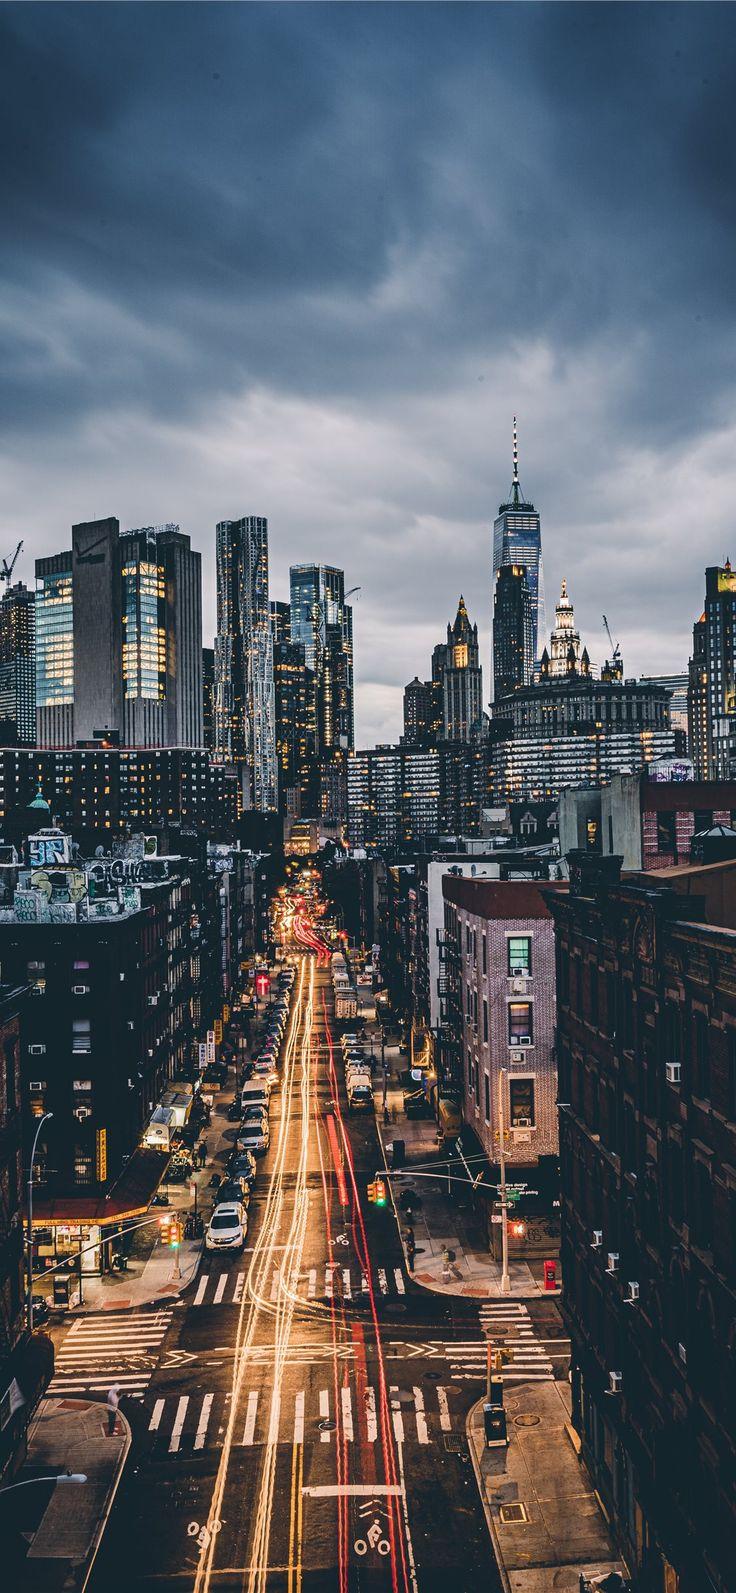 skyline city scenery iPhone 11 Wallpapers ในปี 2020 วอ